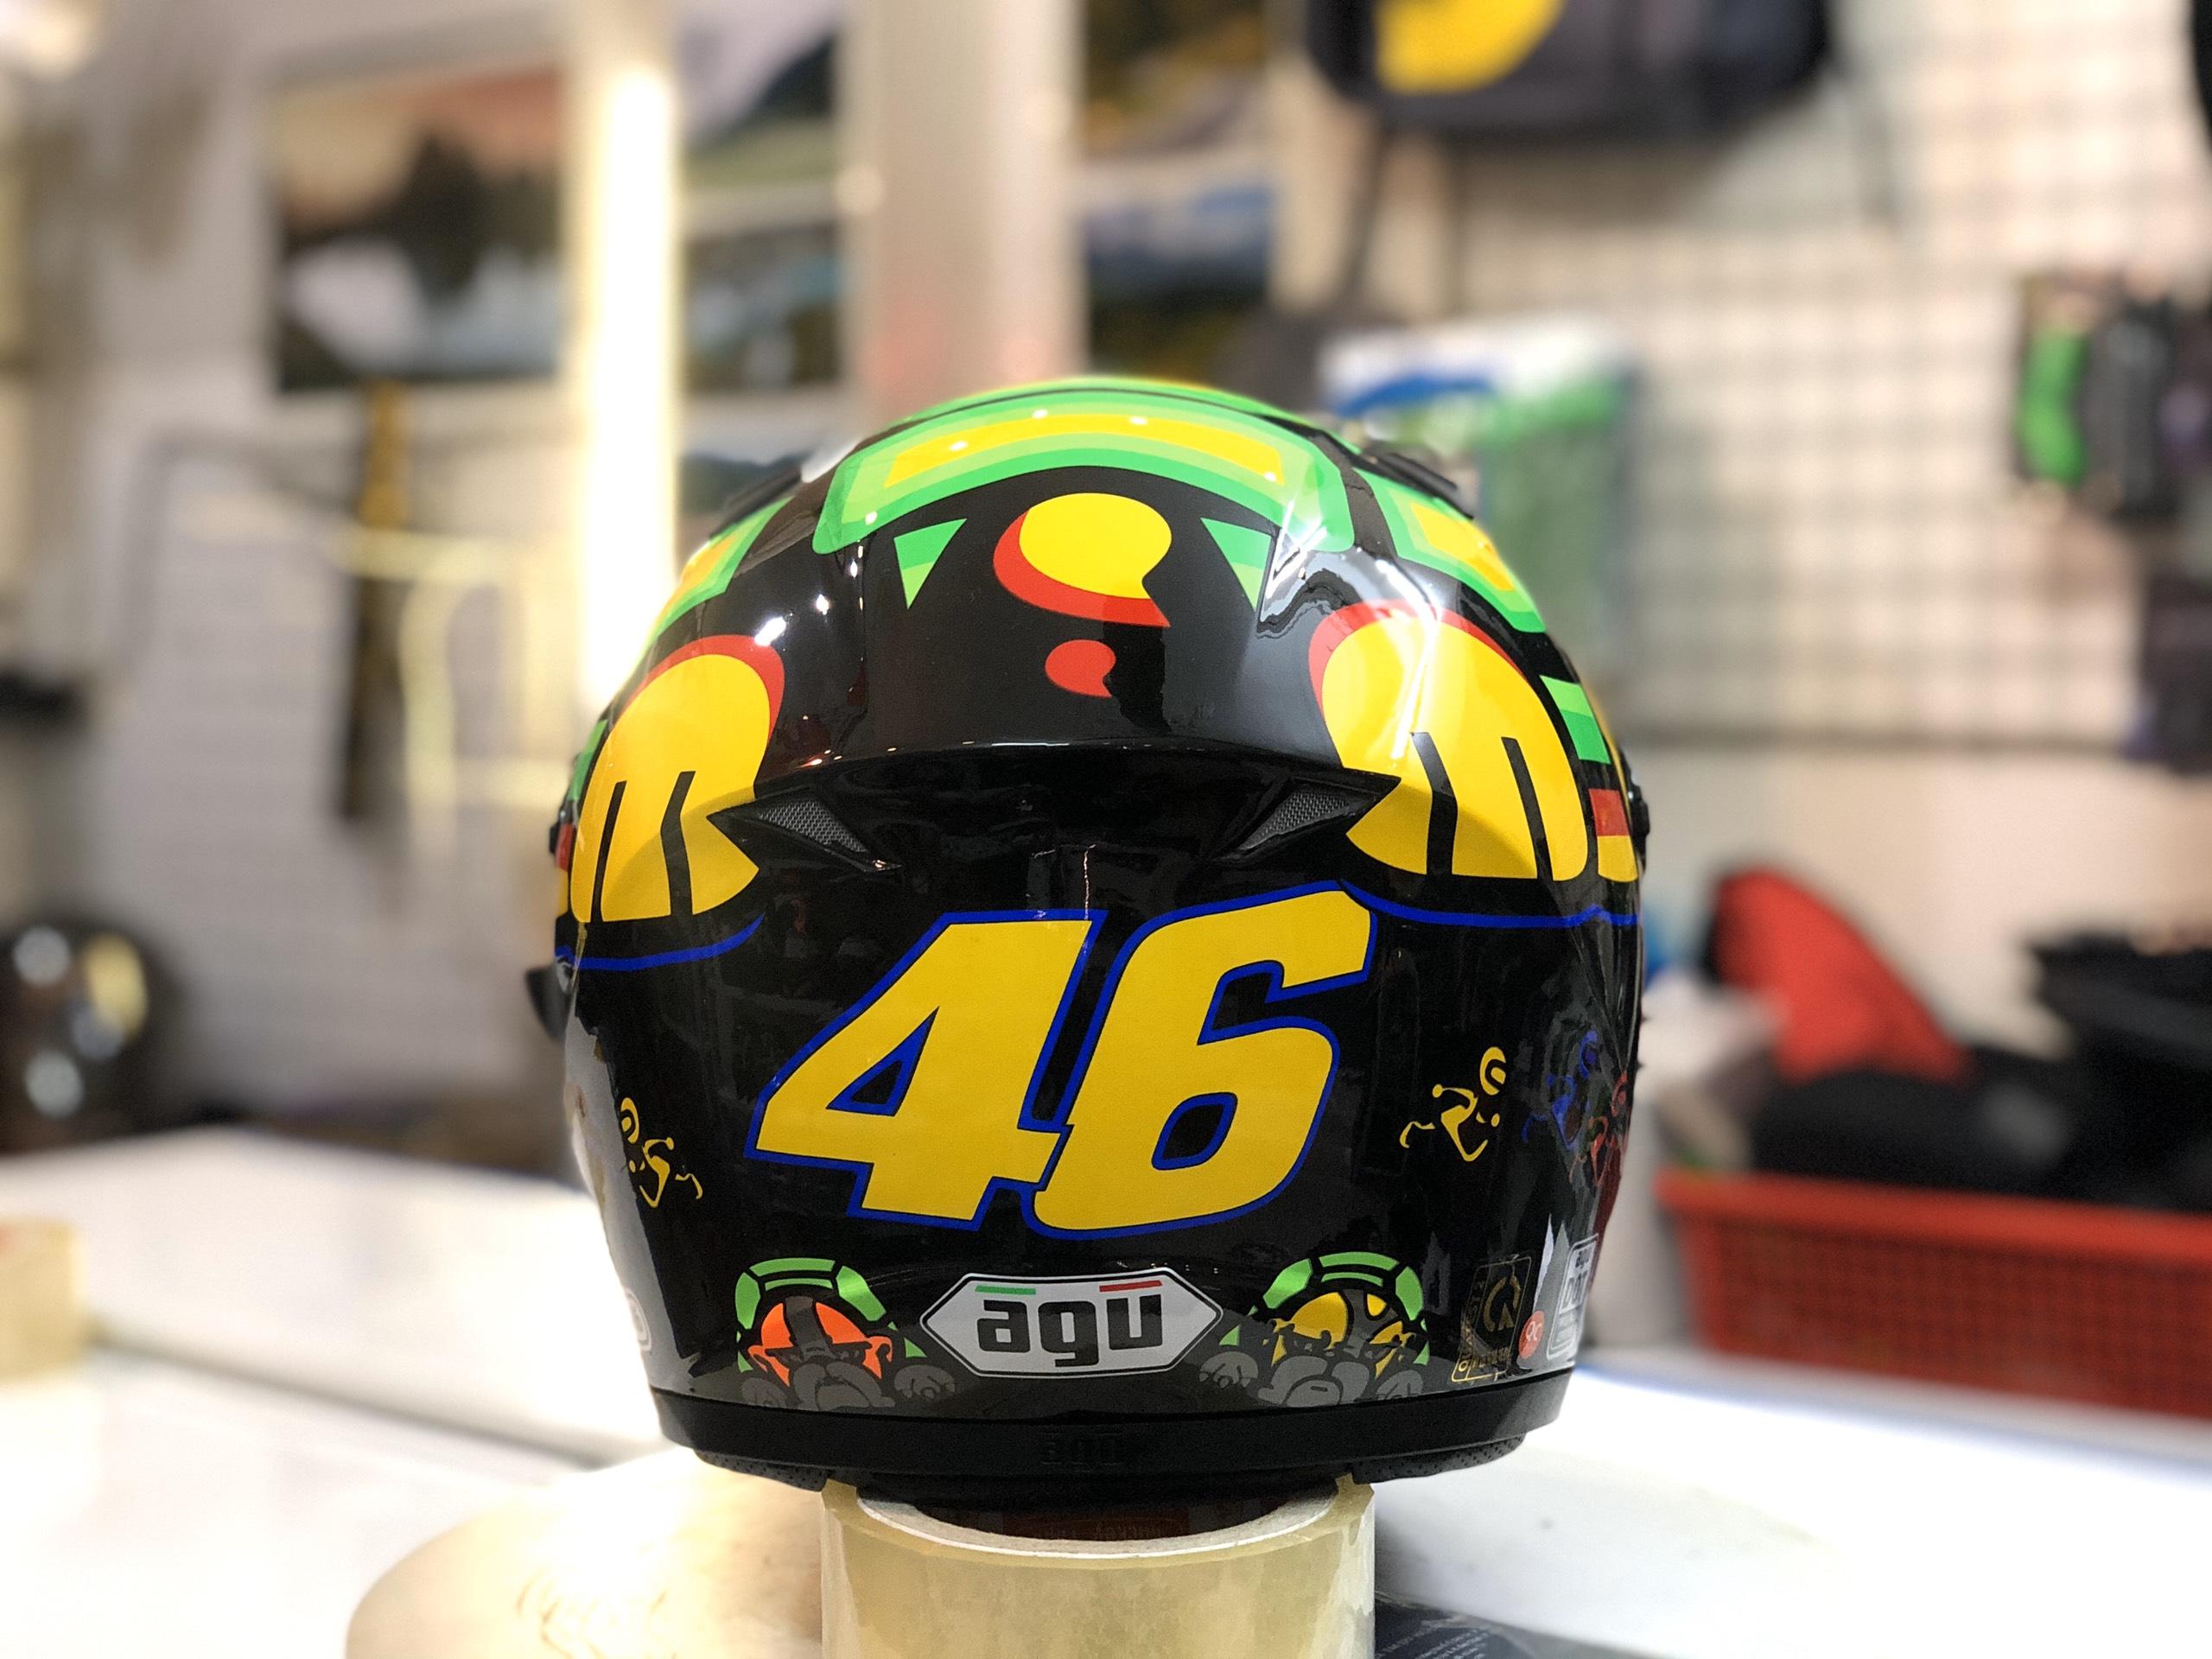 Mũ bảo hiểm AGU tem rùa (4)